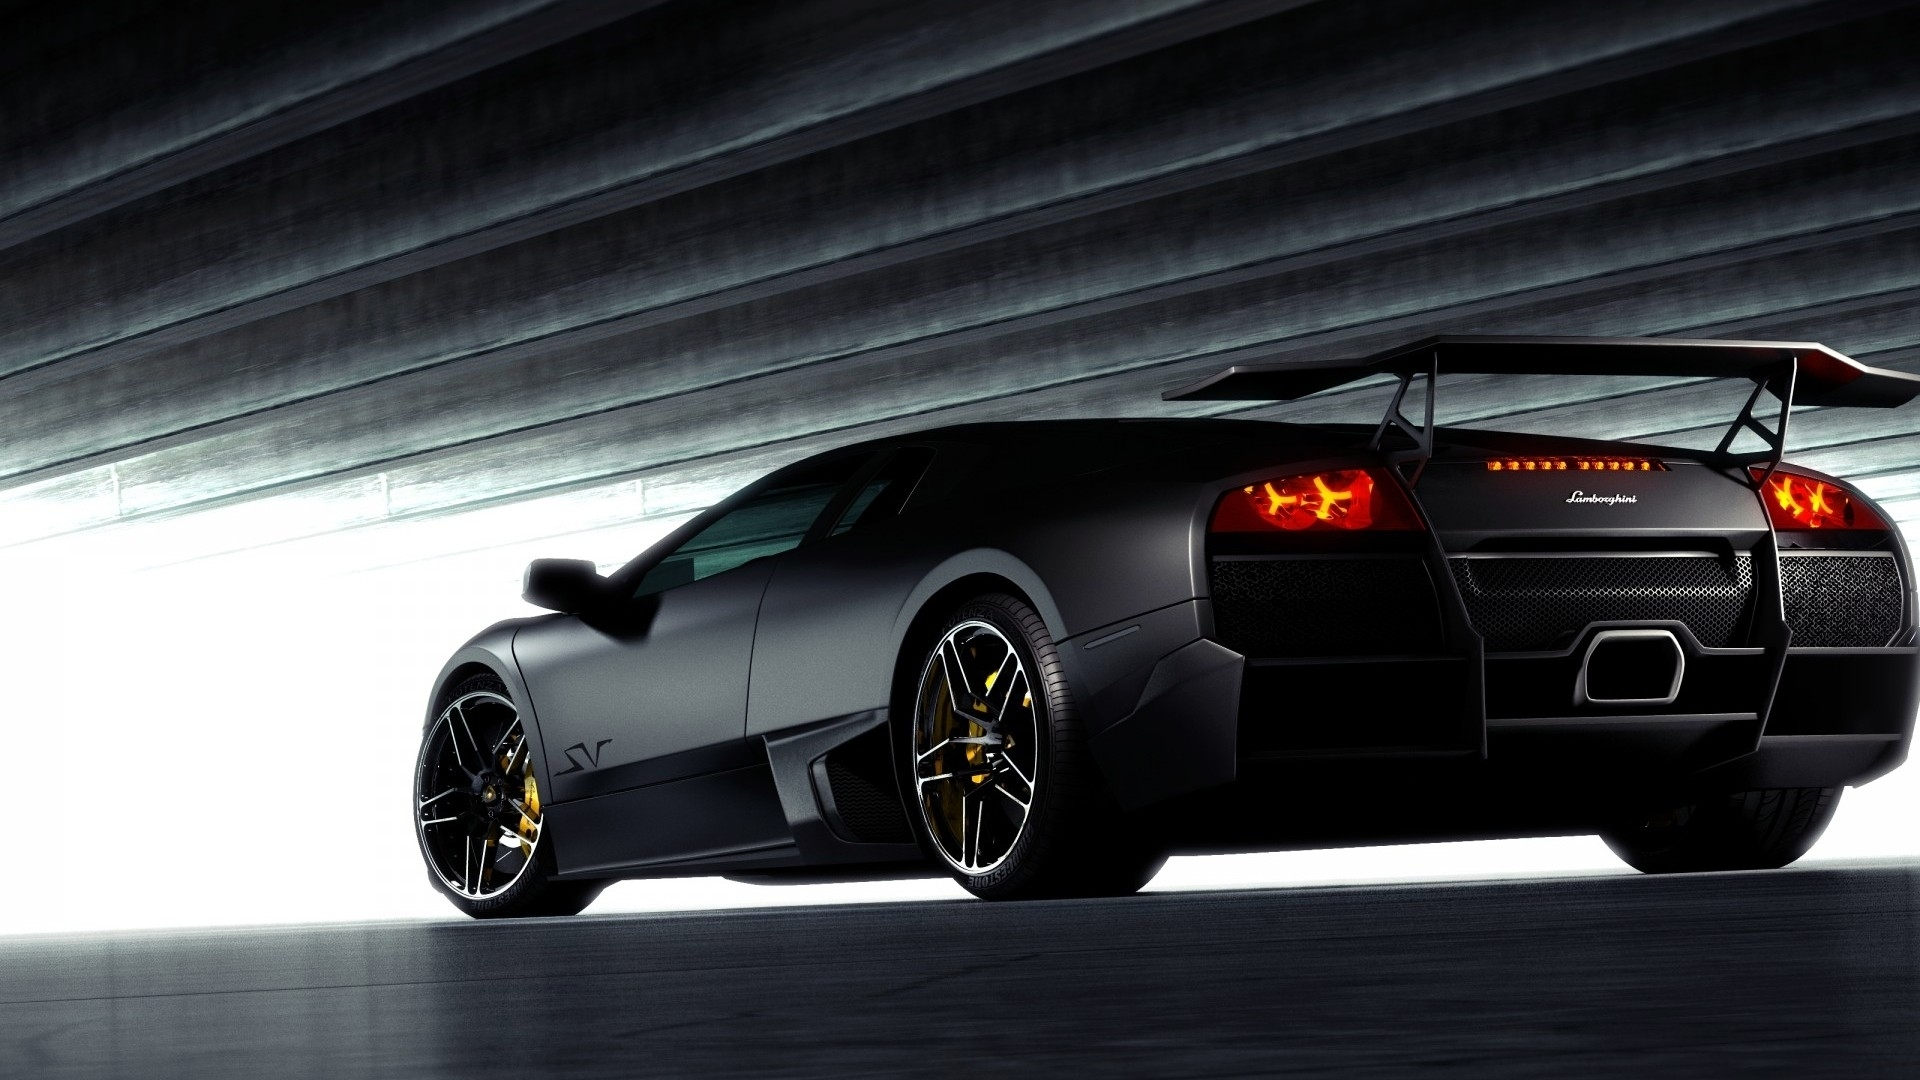 10 best car wallpapers hd 1080p full hd 1080p for pc desktop